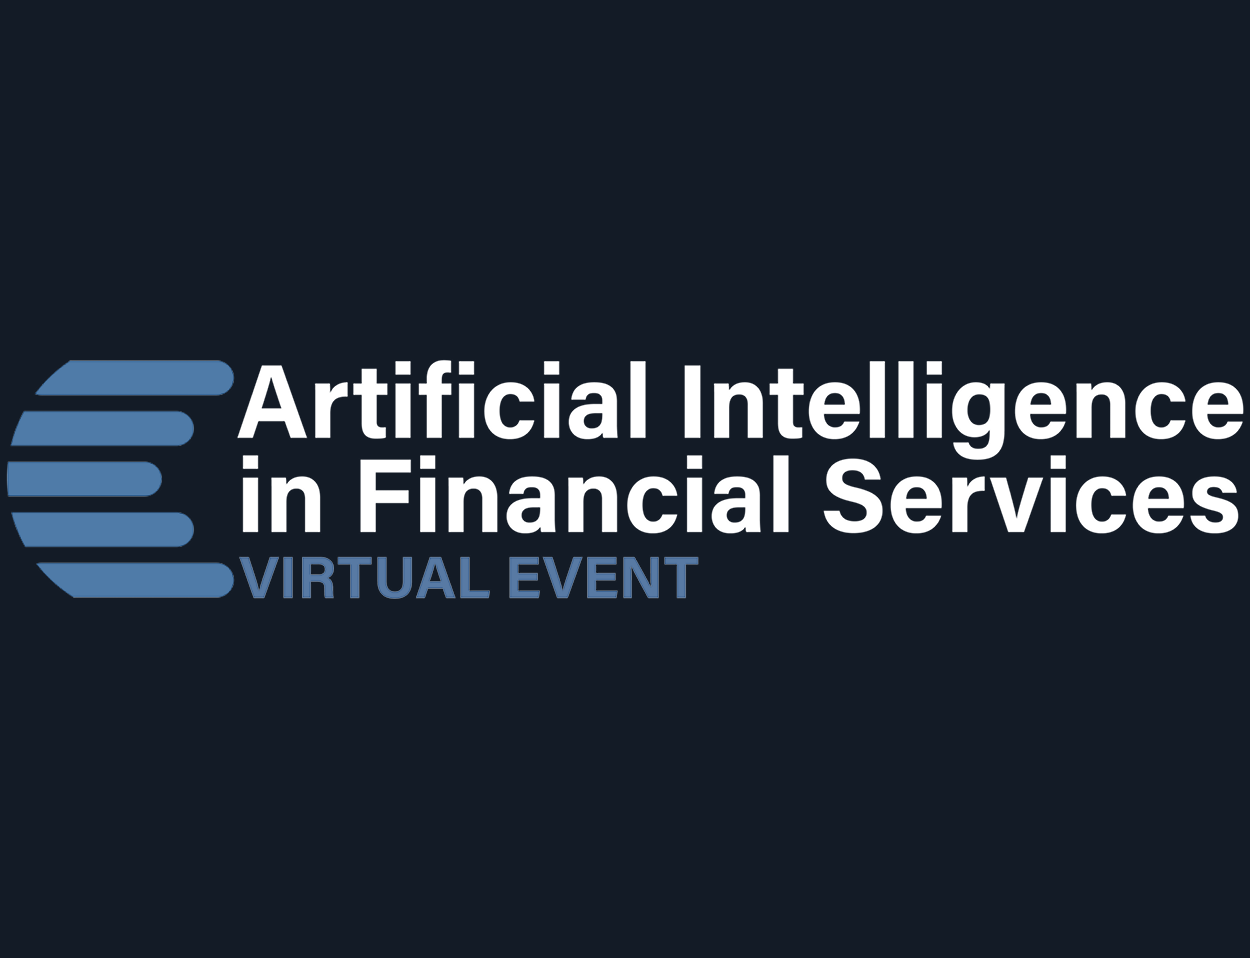 https://fintechnews.sg/wp-content/uploads/2020/02/InsureTech-Connect-Asia.png